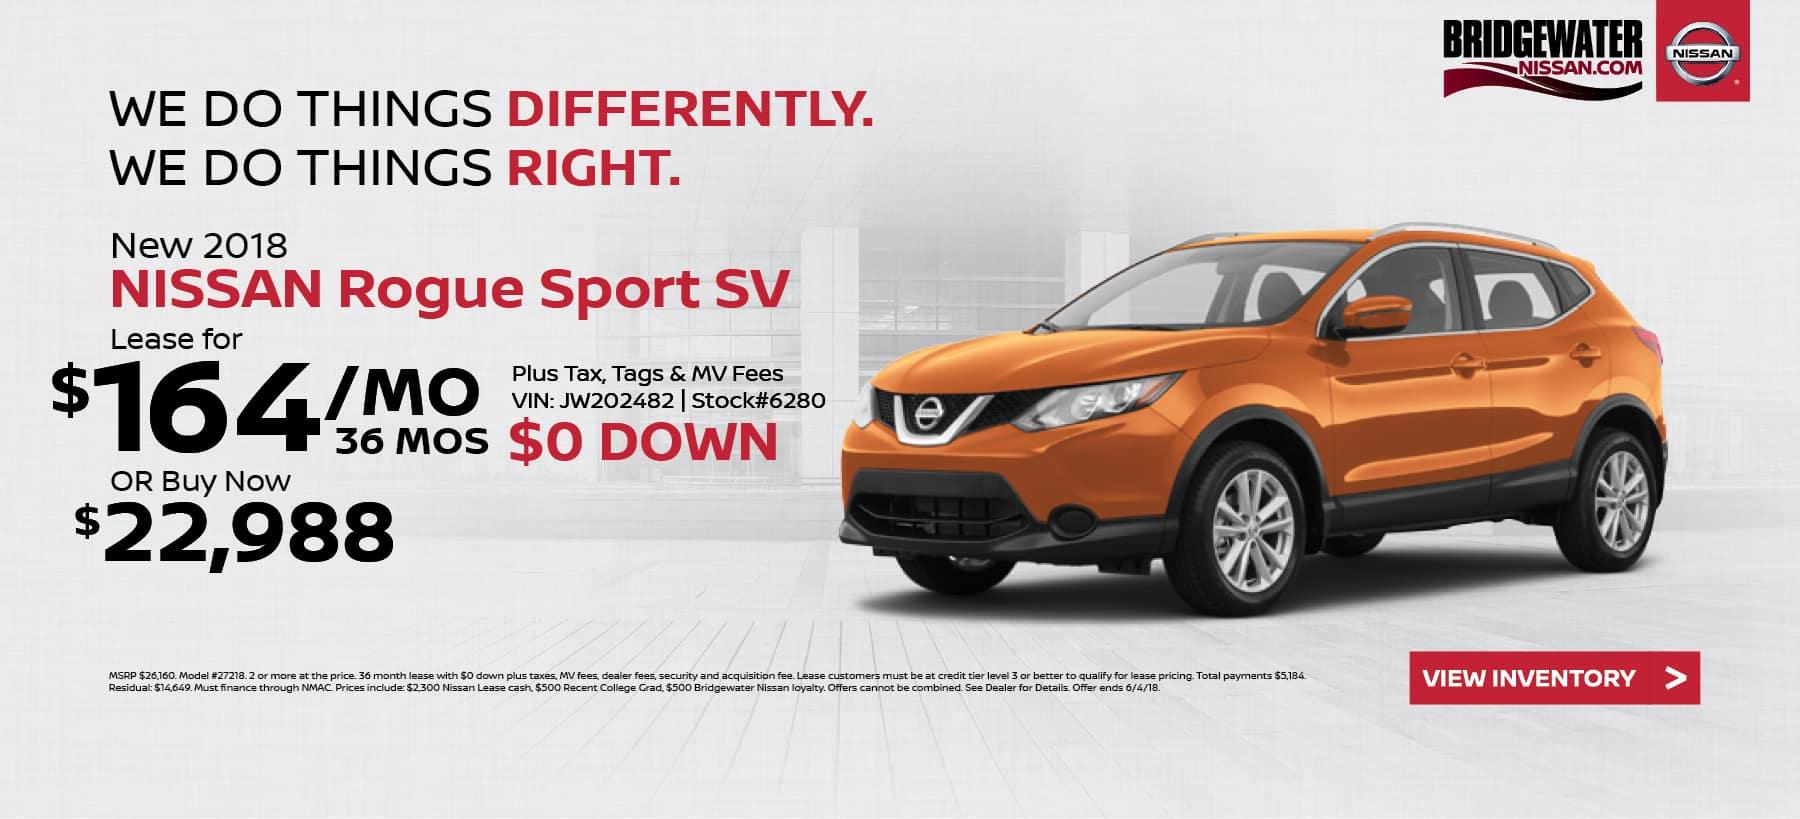 Nissan_RogueSport Bridgewater Nissan May Homepage Offer